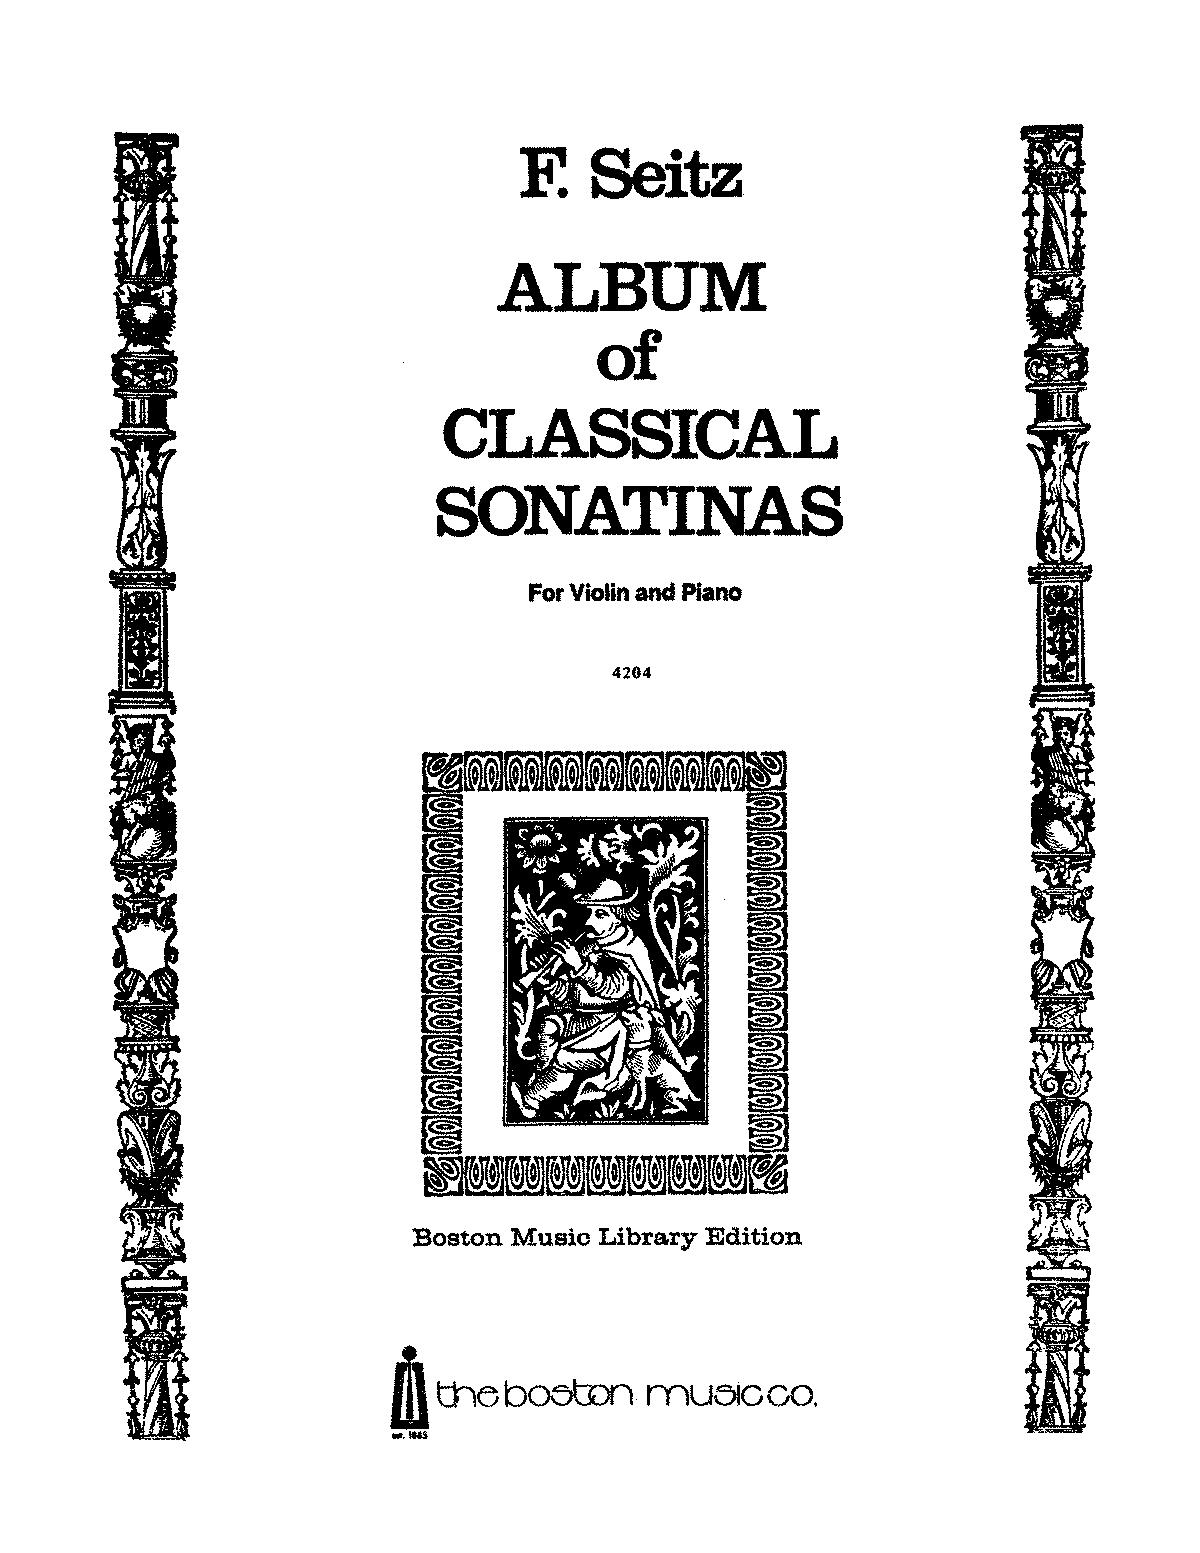 Album of Classical Sonatinas (Seitz, Friedrich) - IMSLP